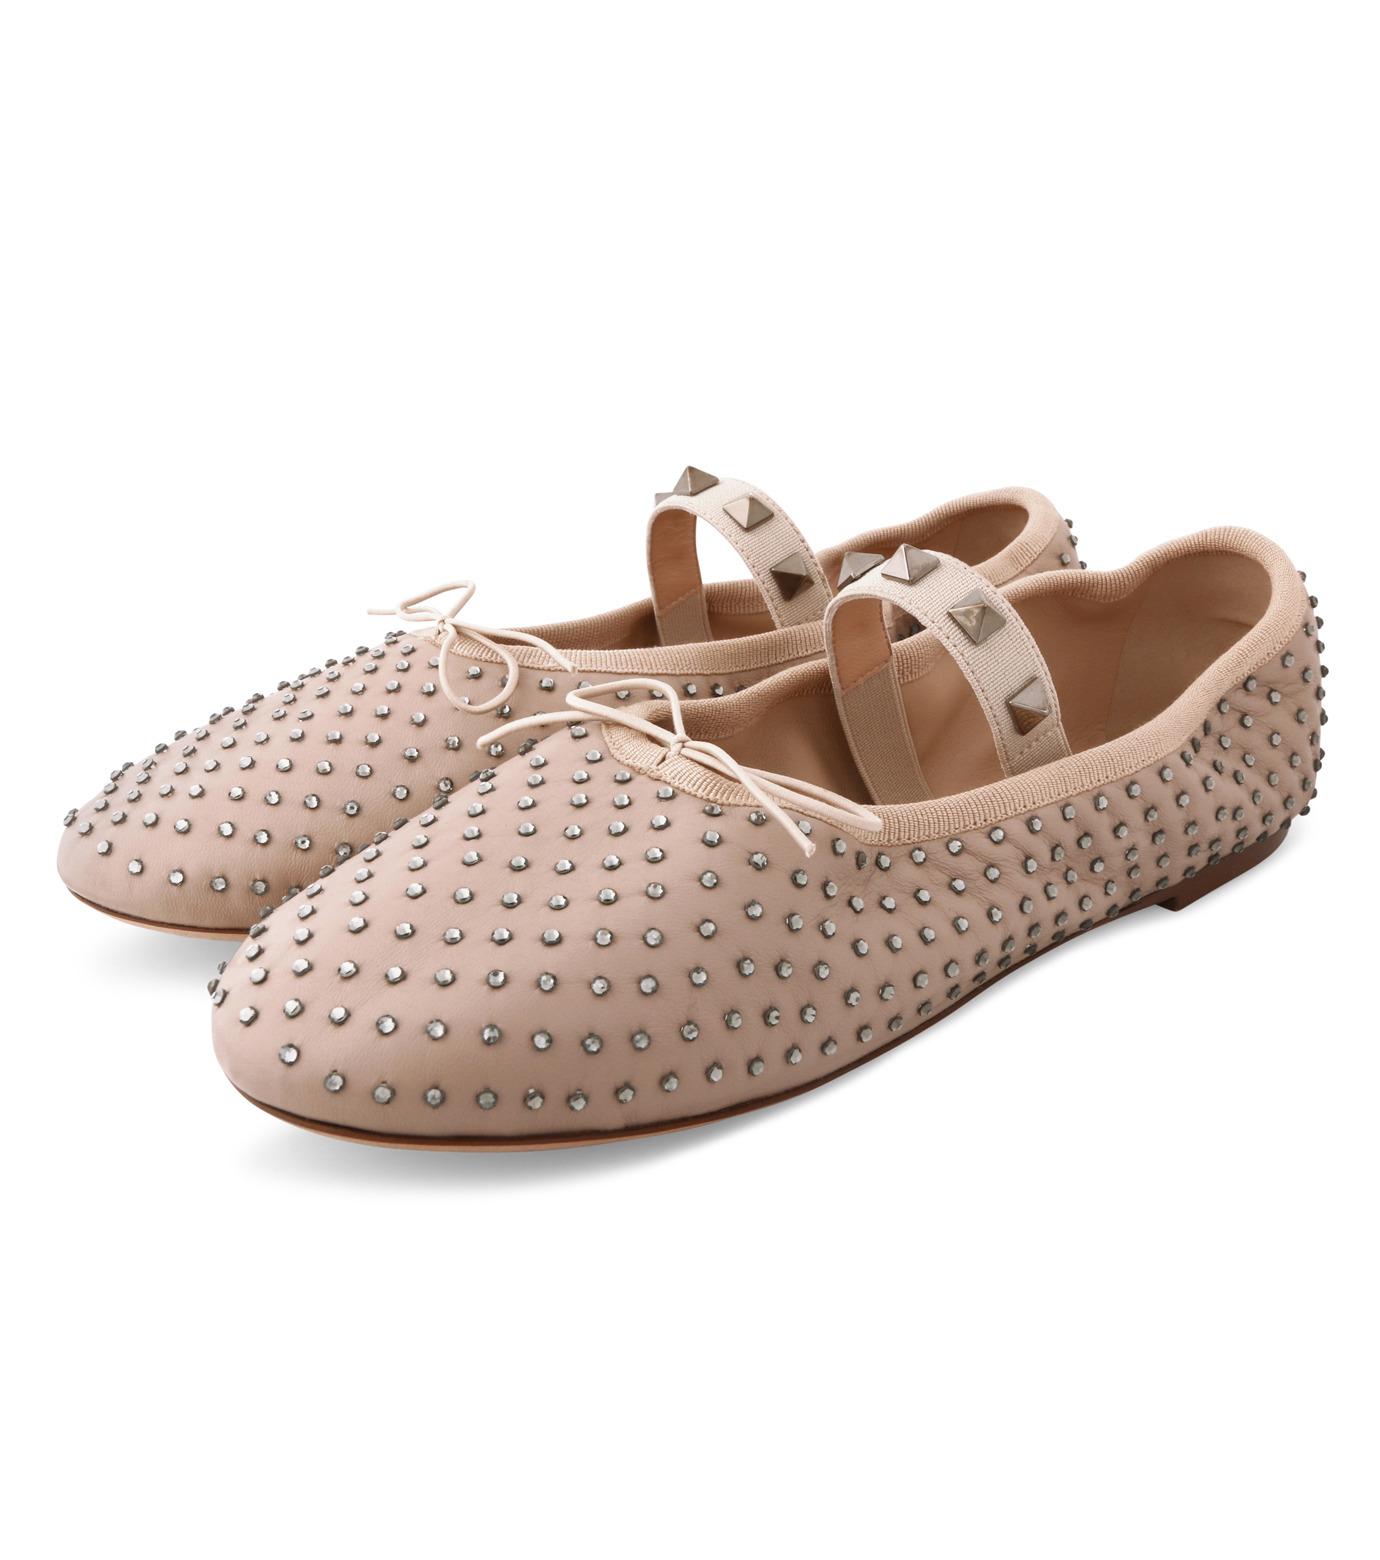 VALENTINO GARAVANI(ヴァレンティノ ガラヴァーニ)のBallerina Flat Strass-BEIGE(フラットシューズ/Flat shoes)-LW0S0A93FNR-52 拡大詳細画像3